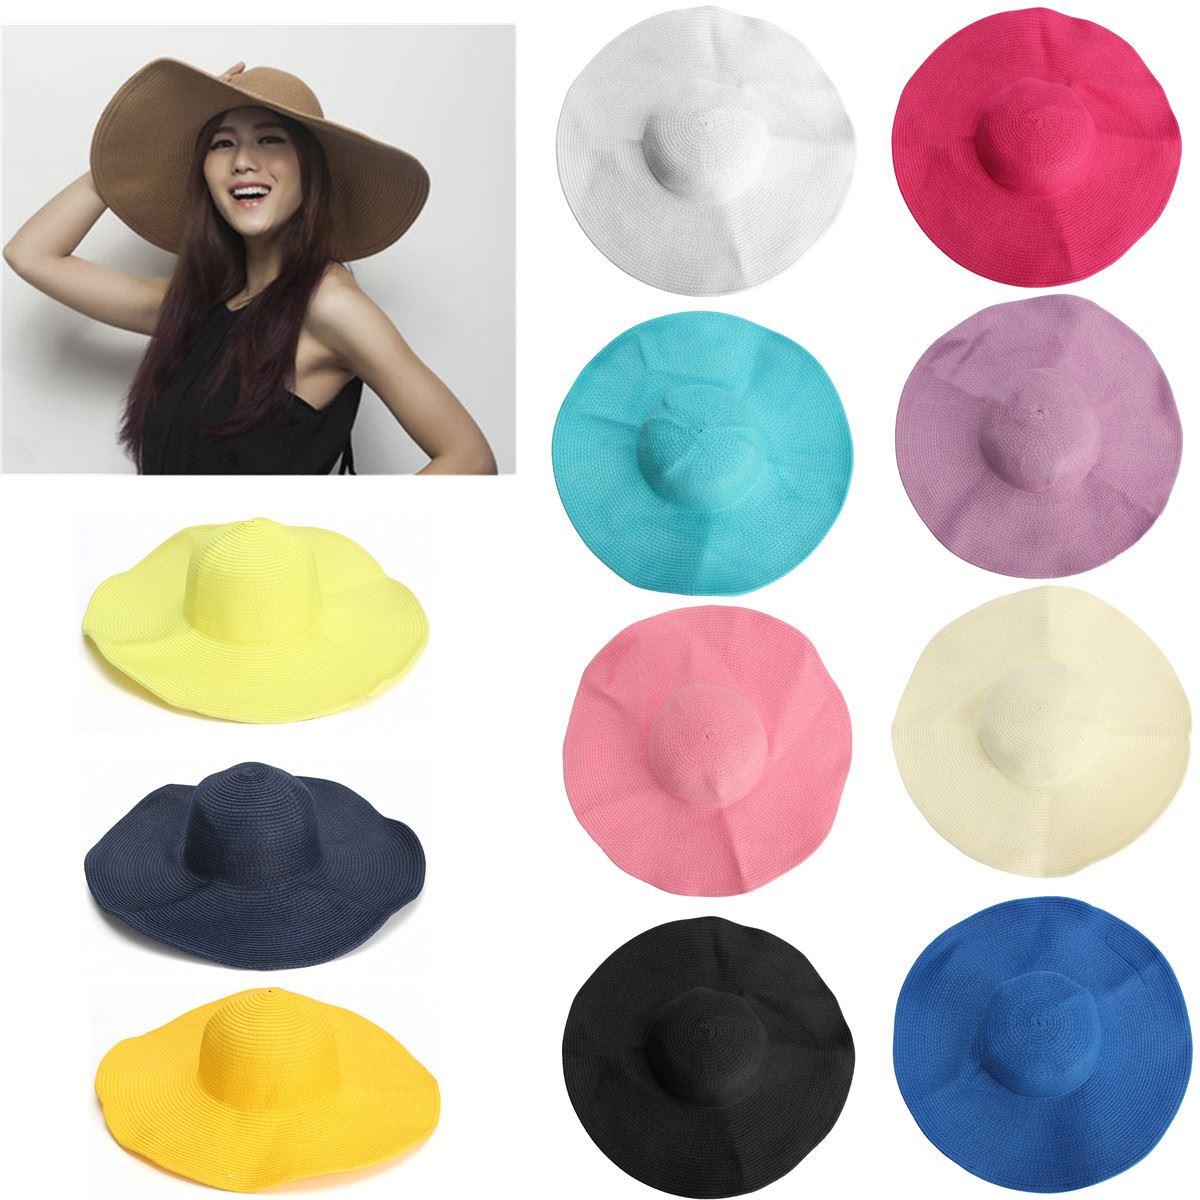 Colorful Floppy Hats Beach Sun Hat 14 Colors